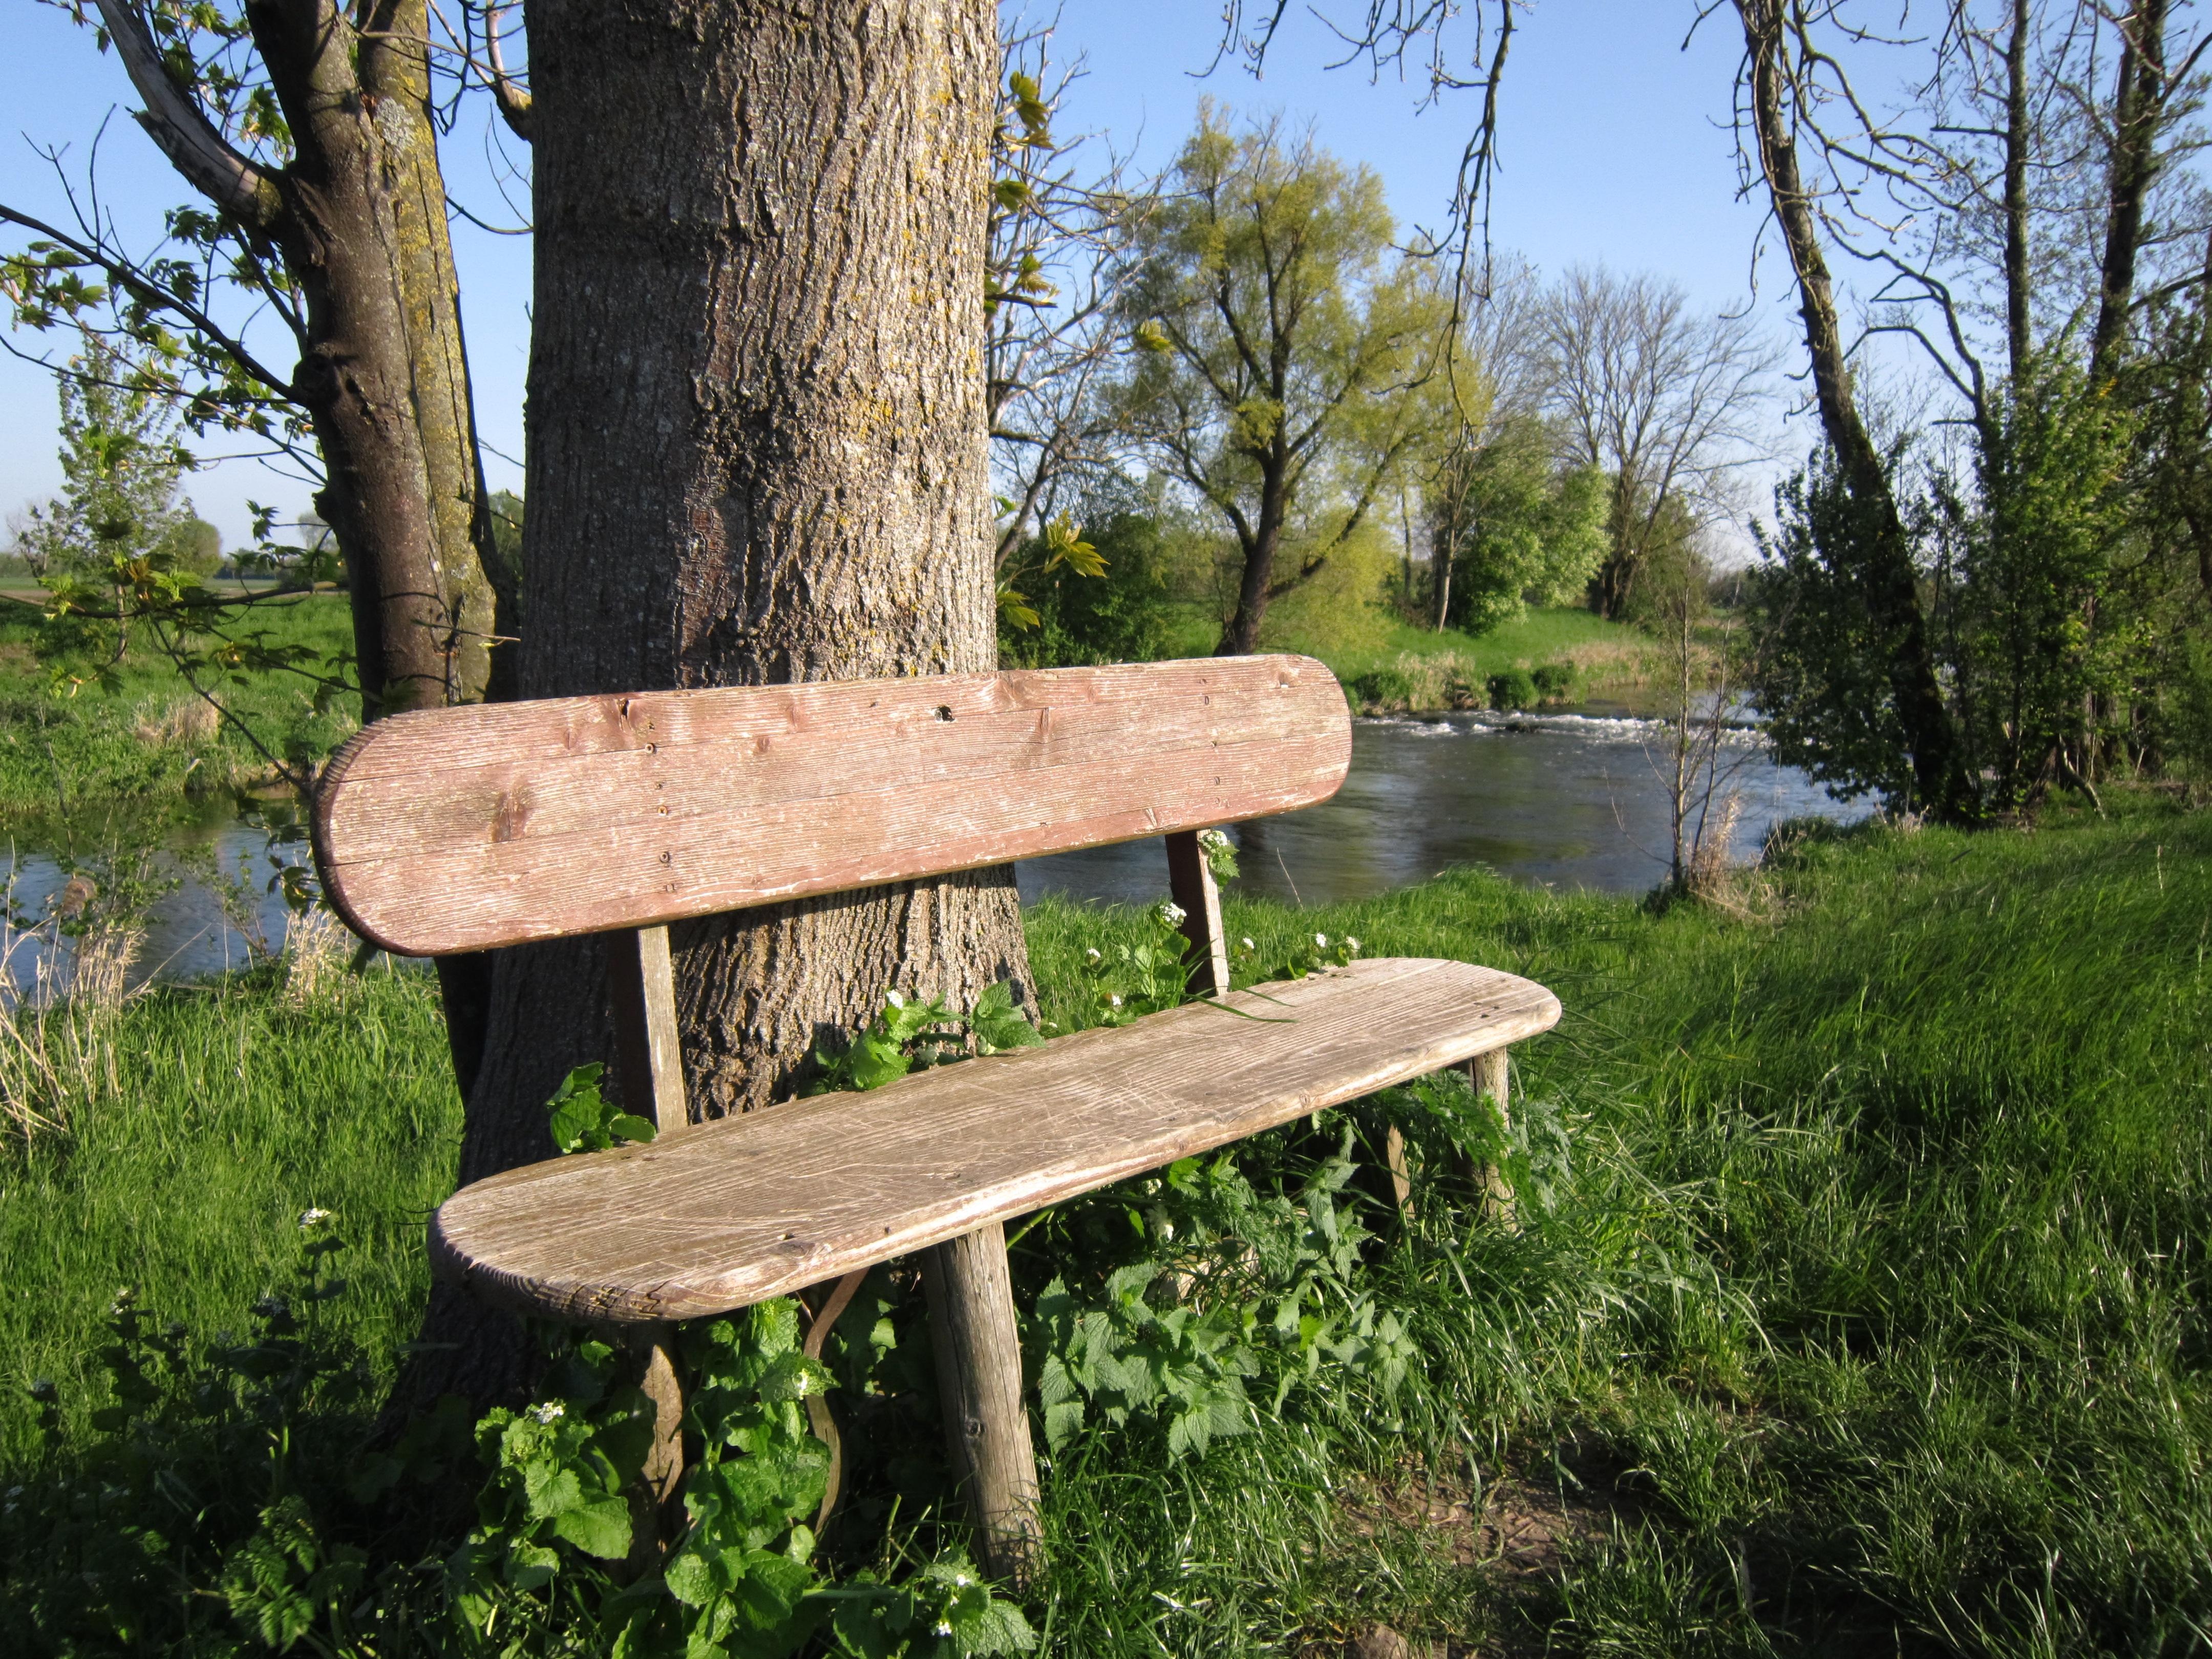 Tree Nature Wood Bench Seat Spring Park Backyard Romantic Rest Furniture  Garden Wooden Bench Bank Break